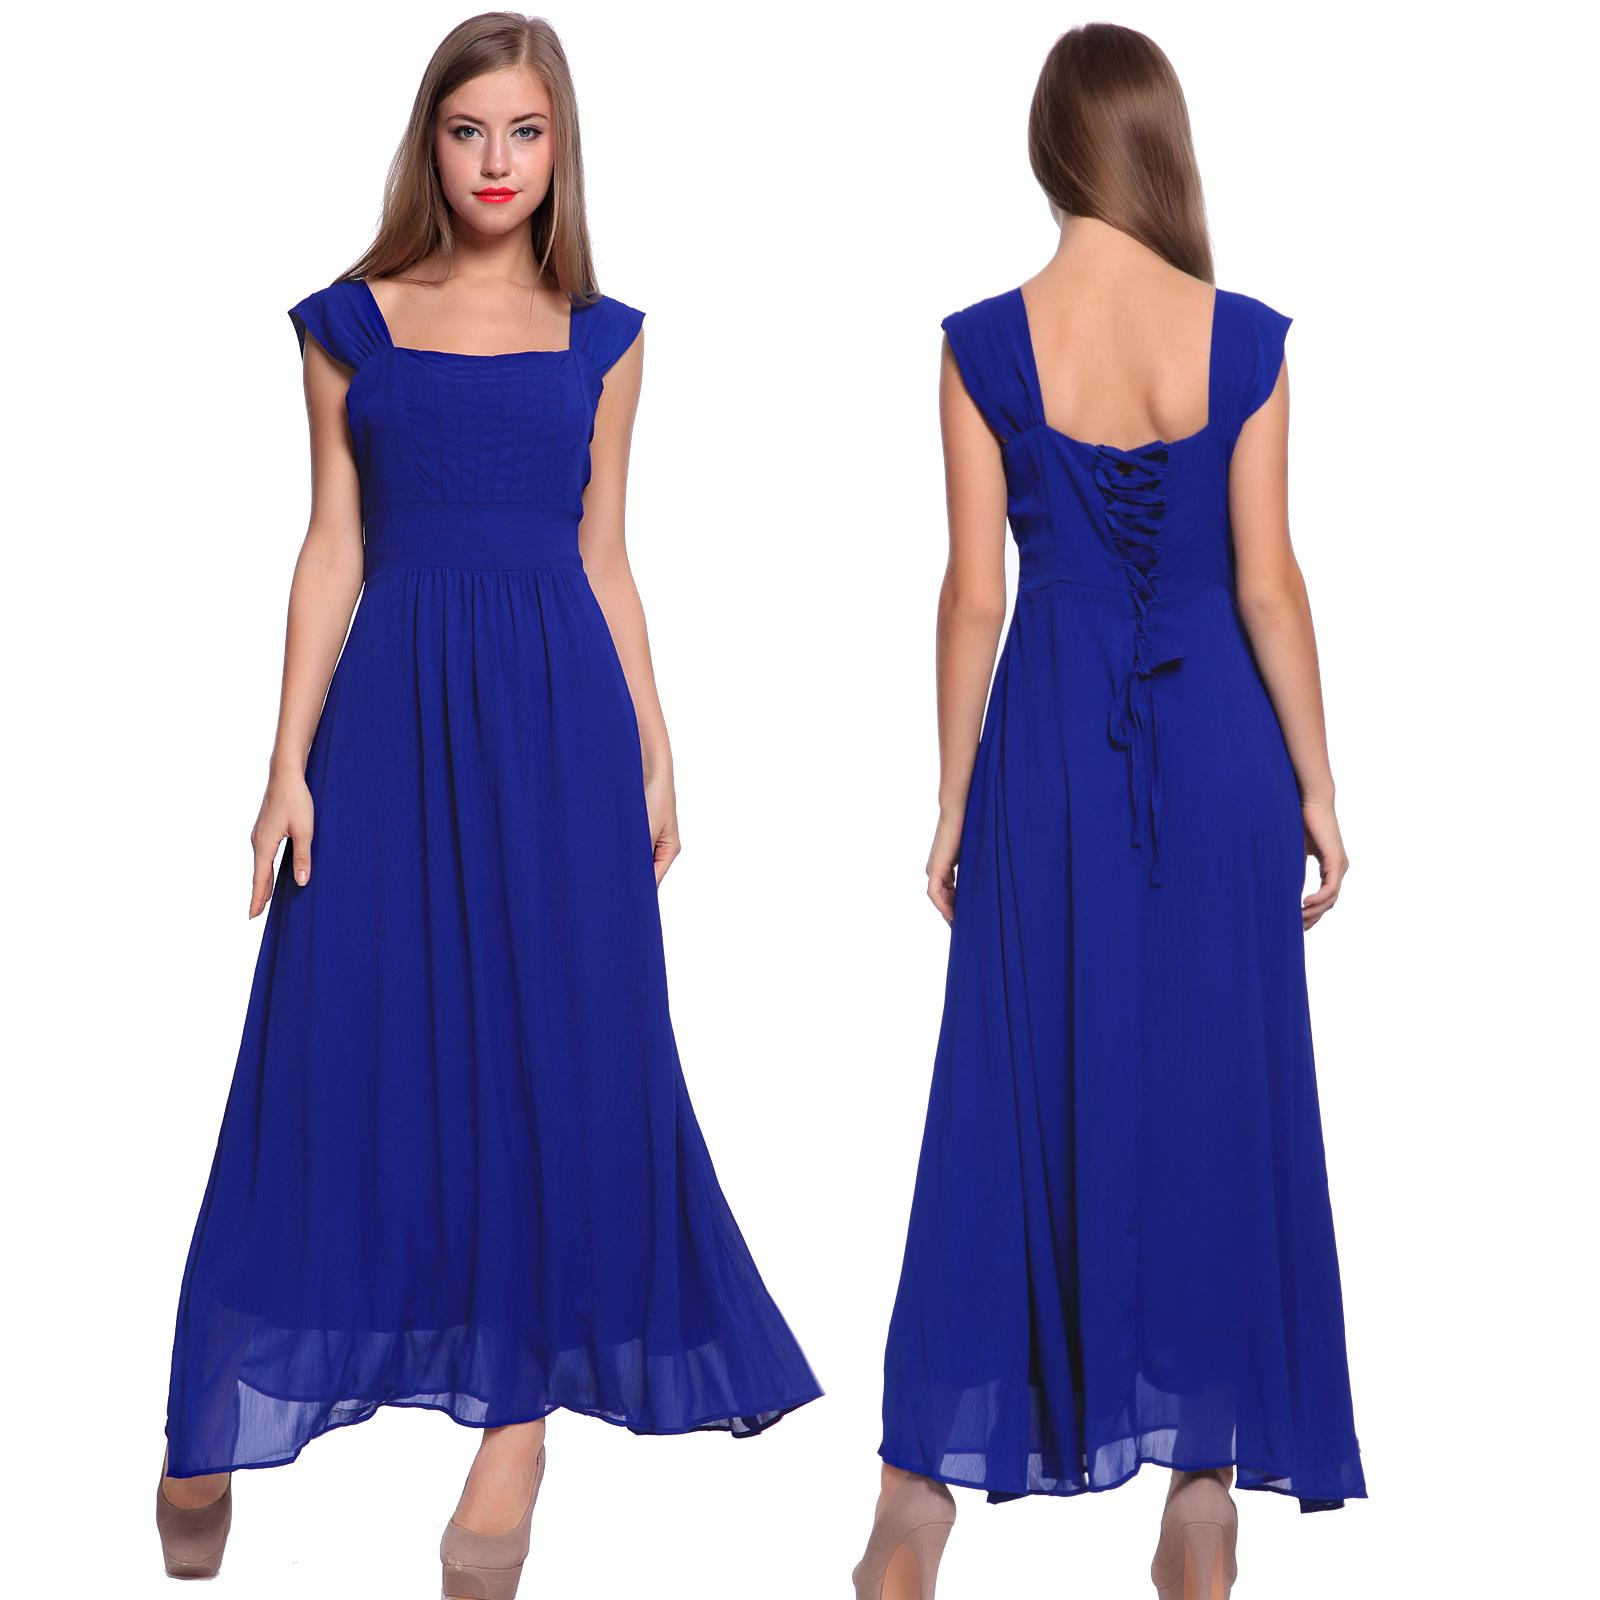 robe longue maxi sans manche elegant mariage soiree femme